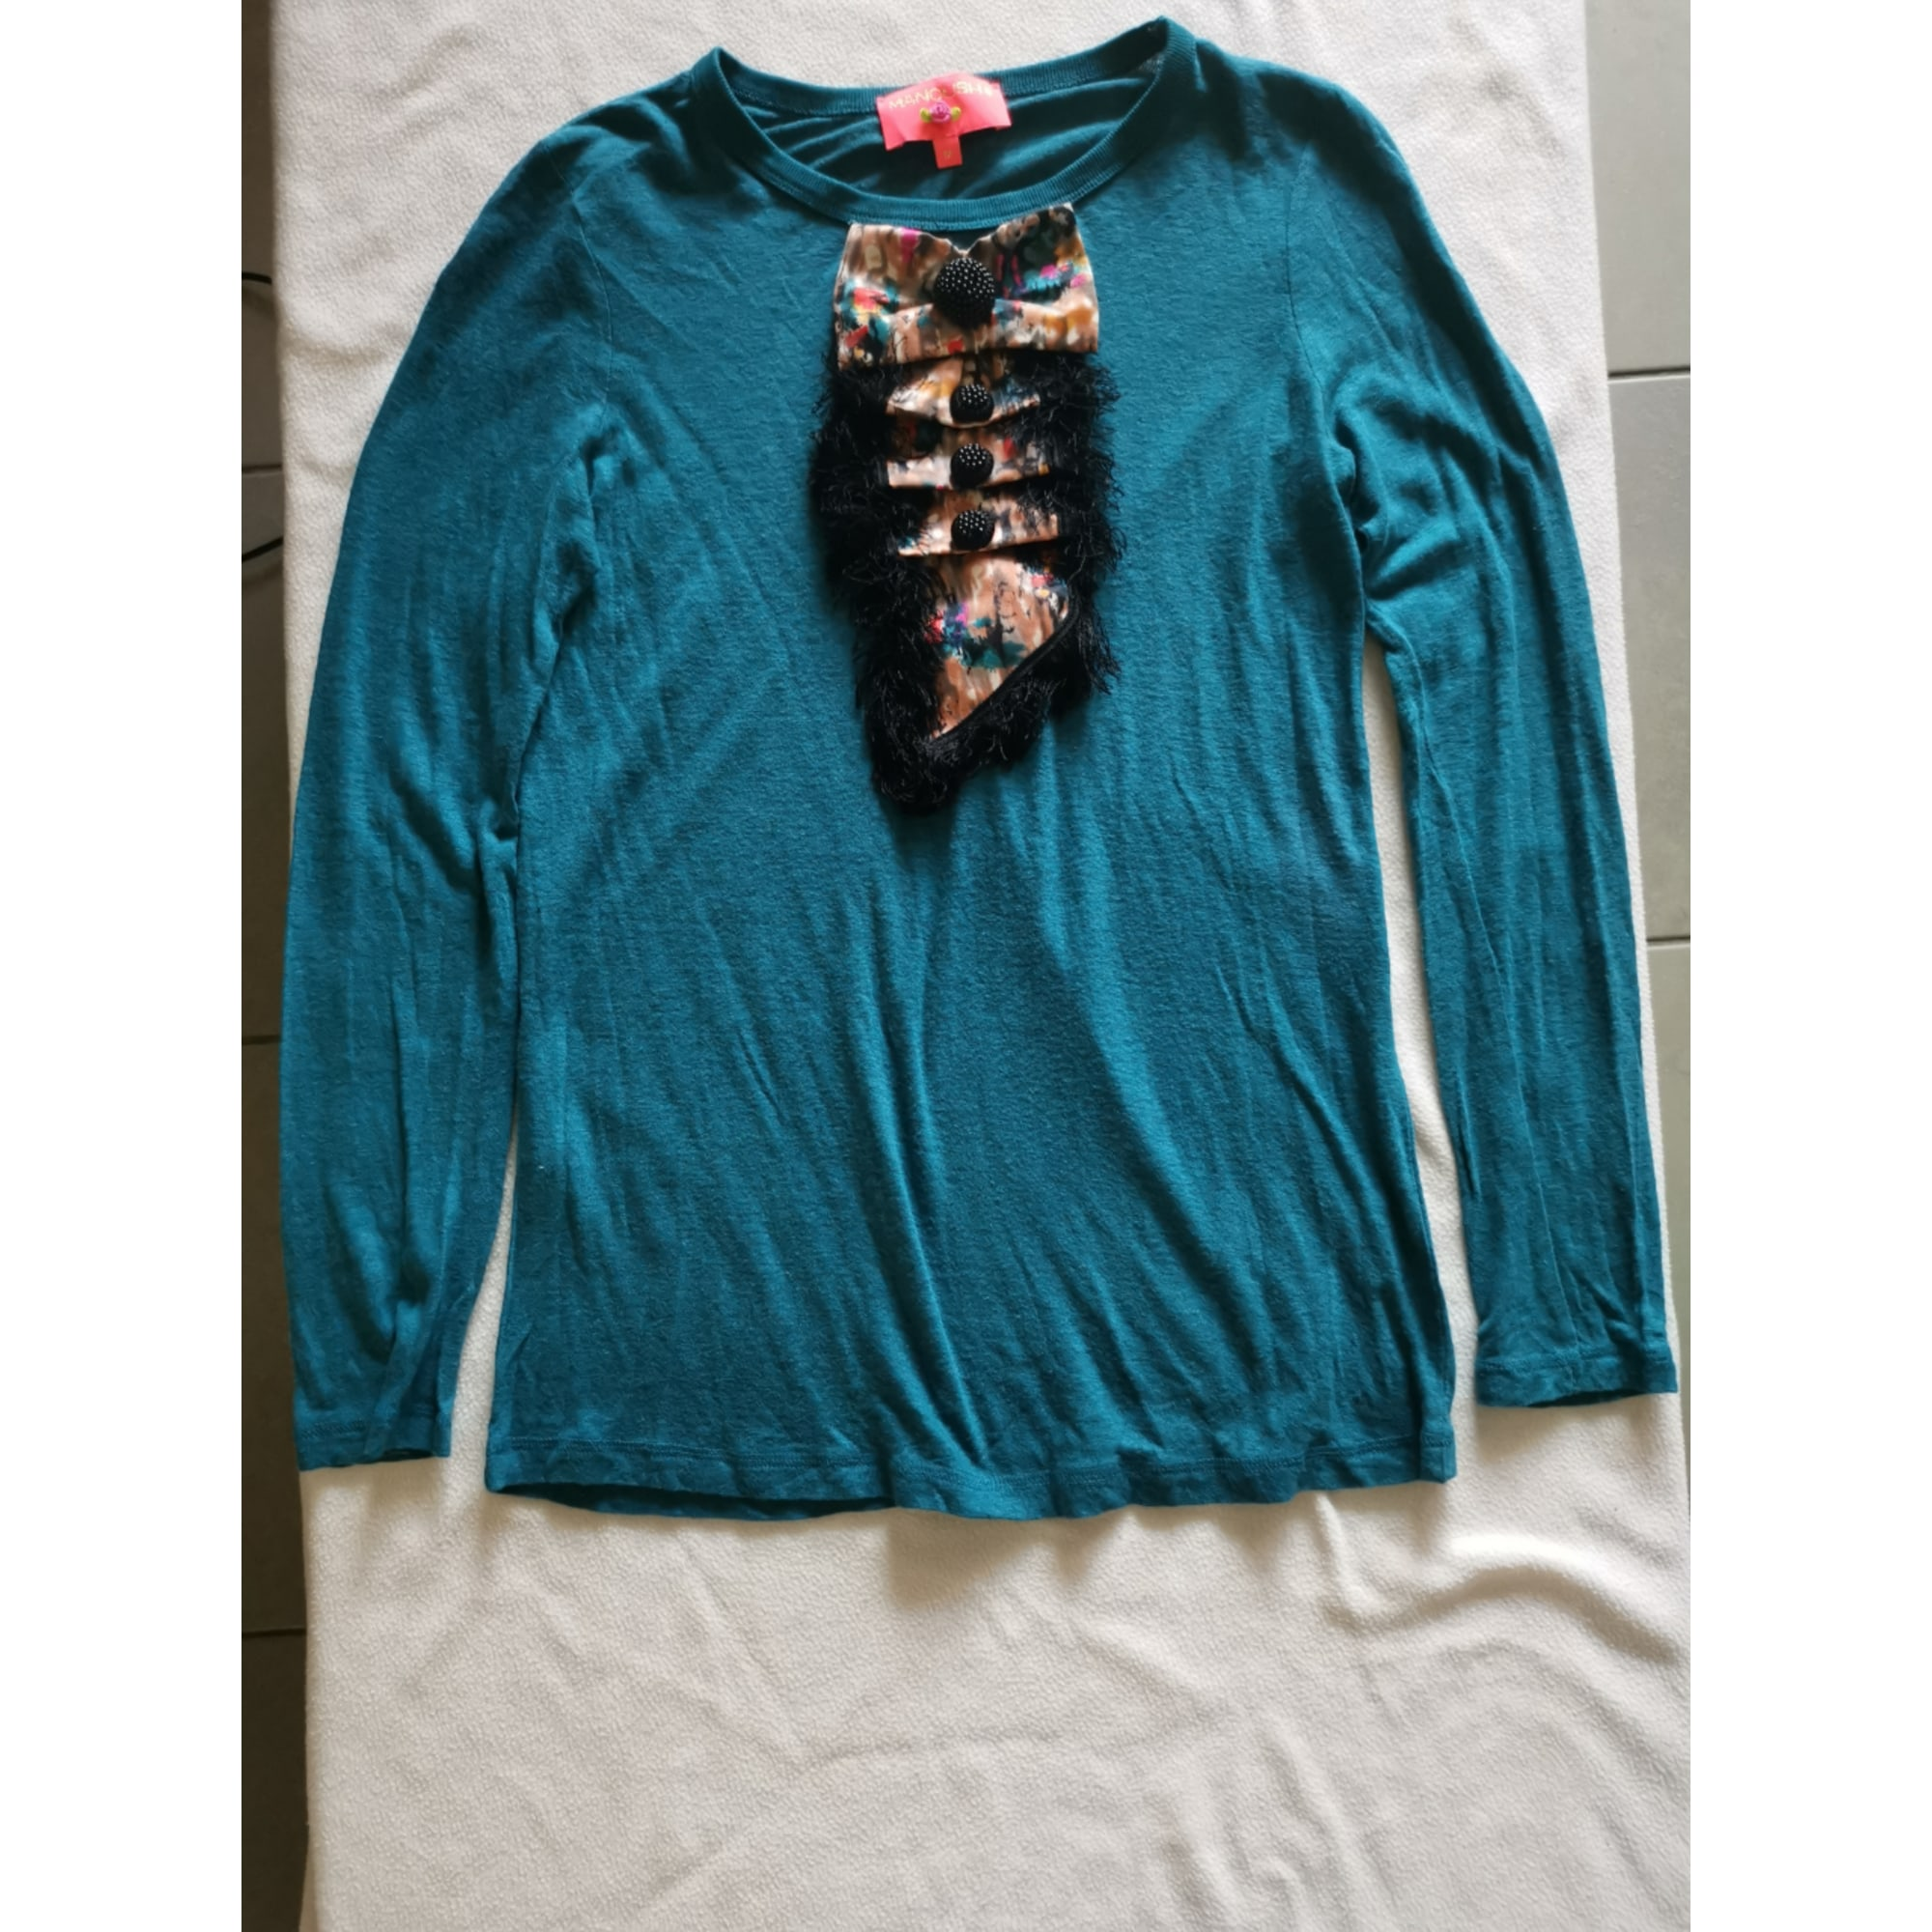 Top, tee-shirt MANOUSH Multicouleur